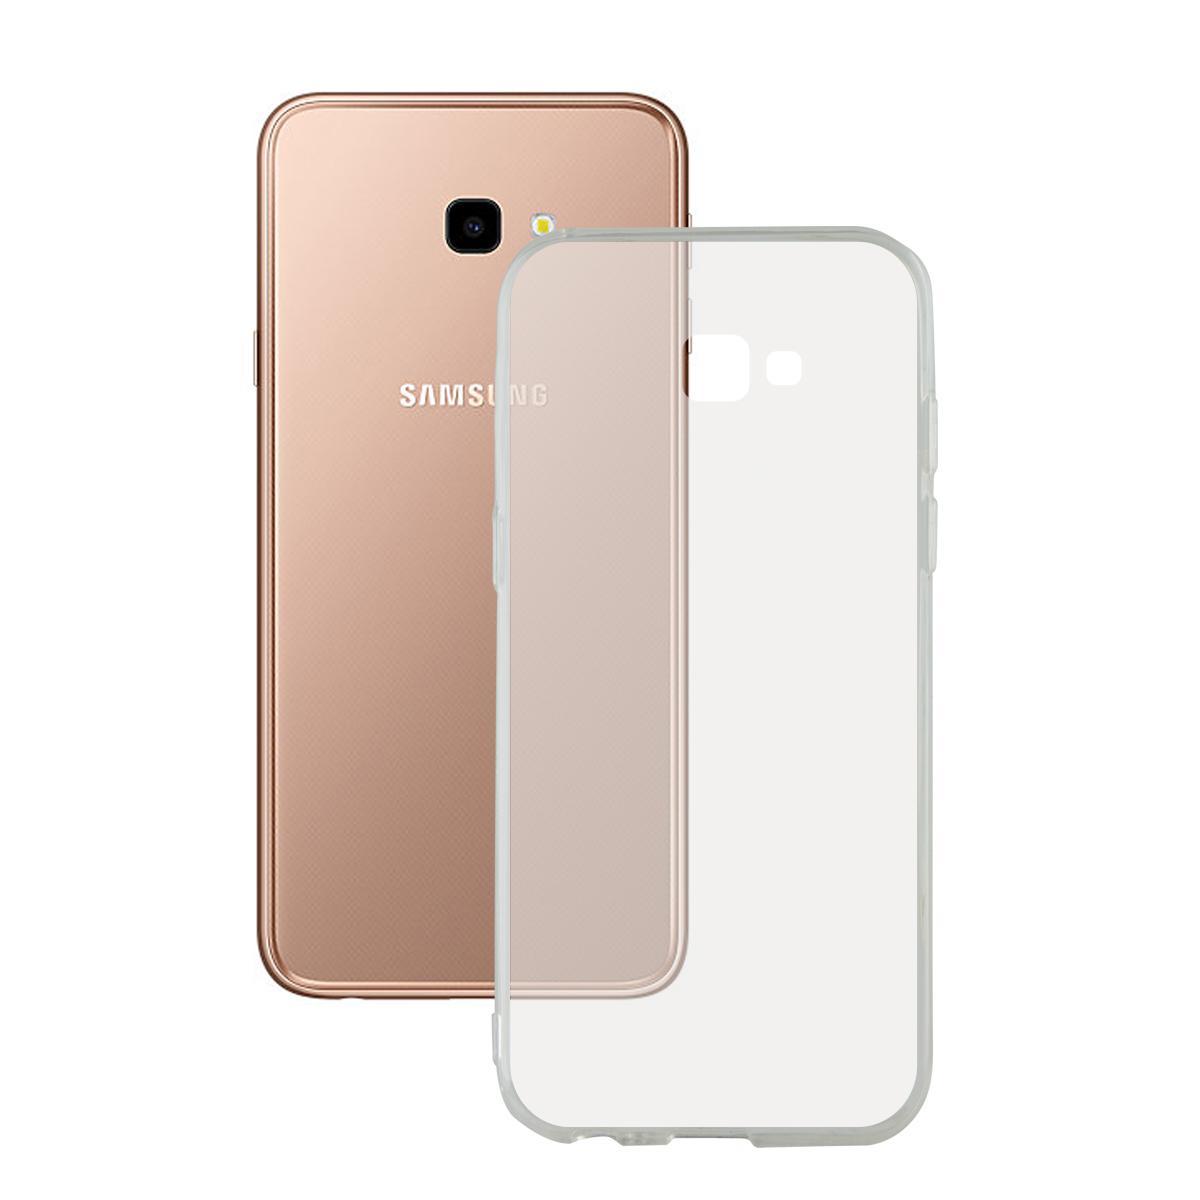 Ốp Silicon cho Samsung J4 Plus 2018 / J4+ Trong suốt (Loại A+ chống ố vàng)